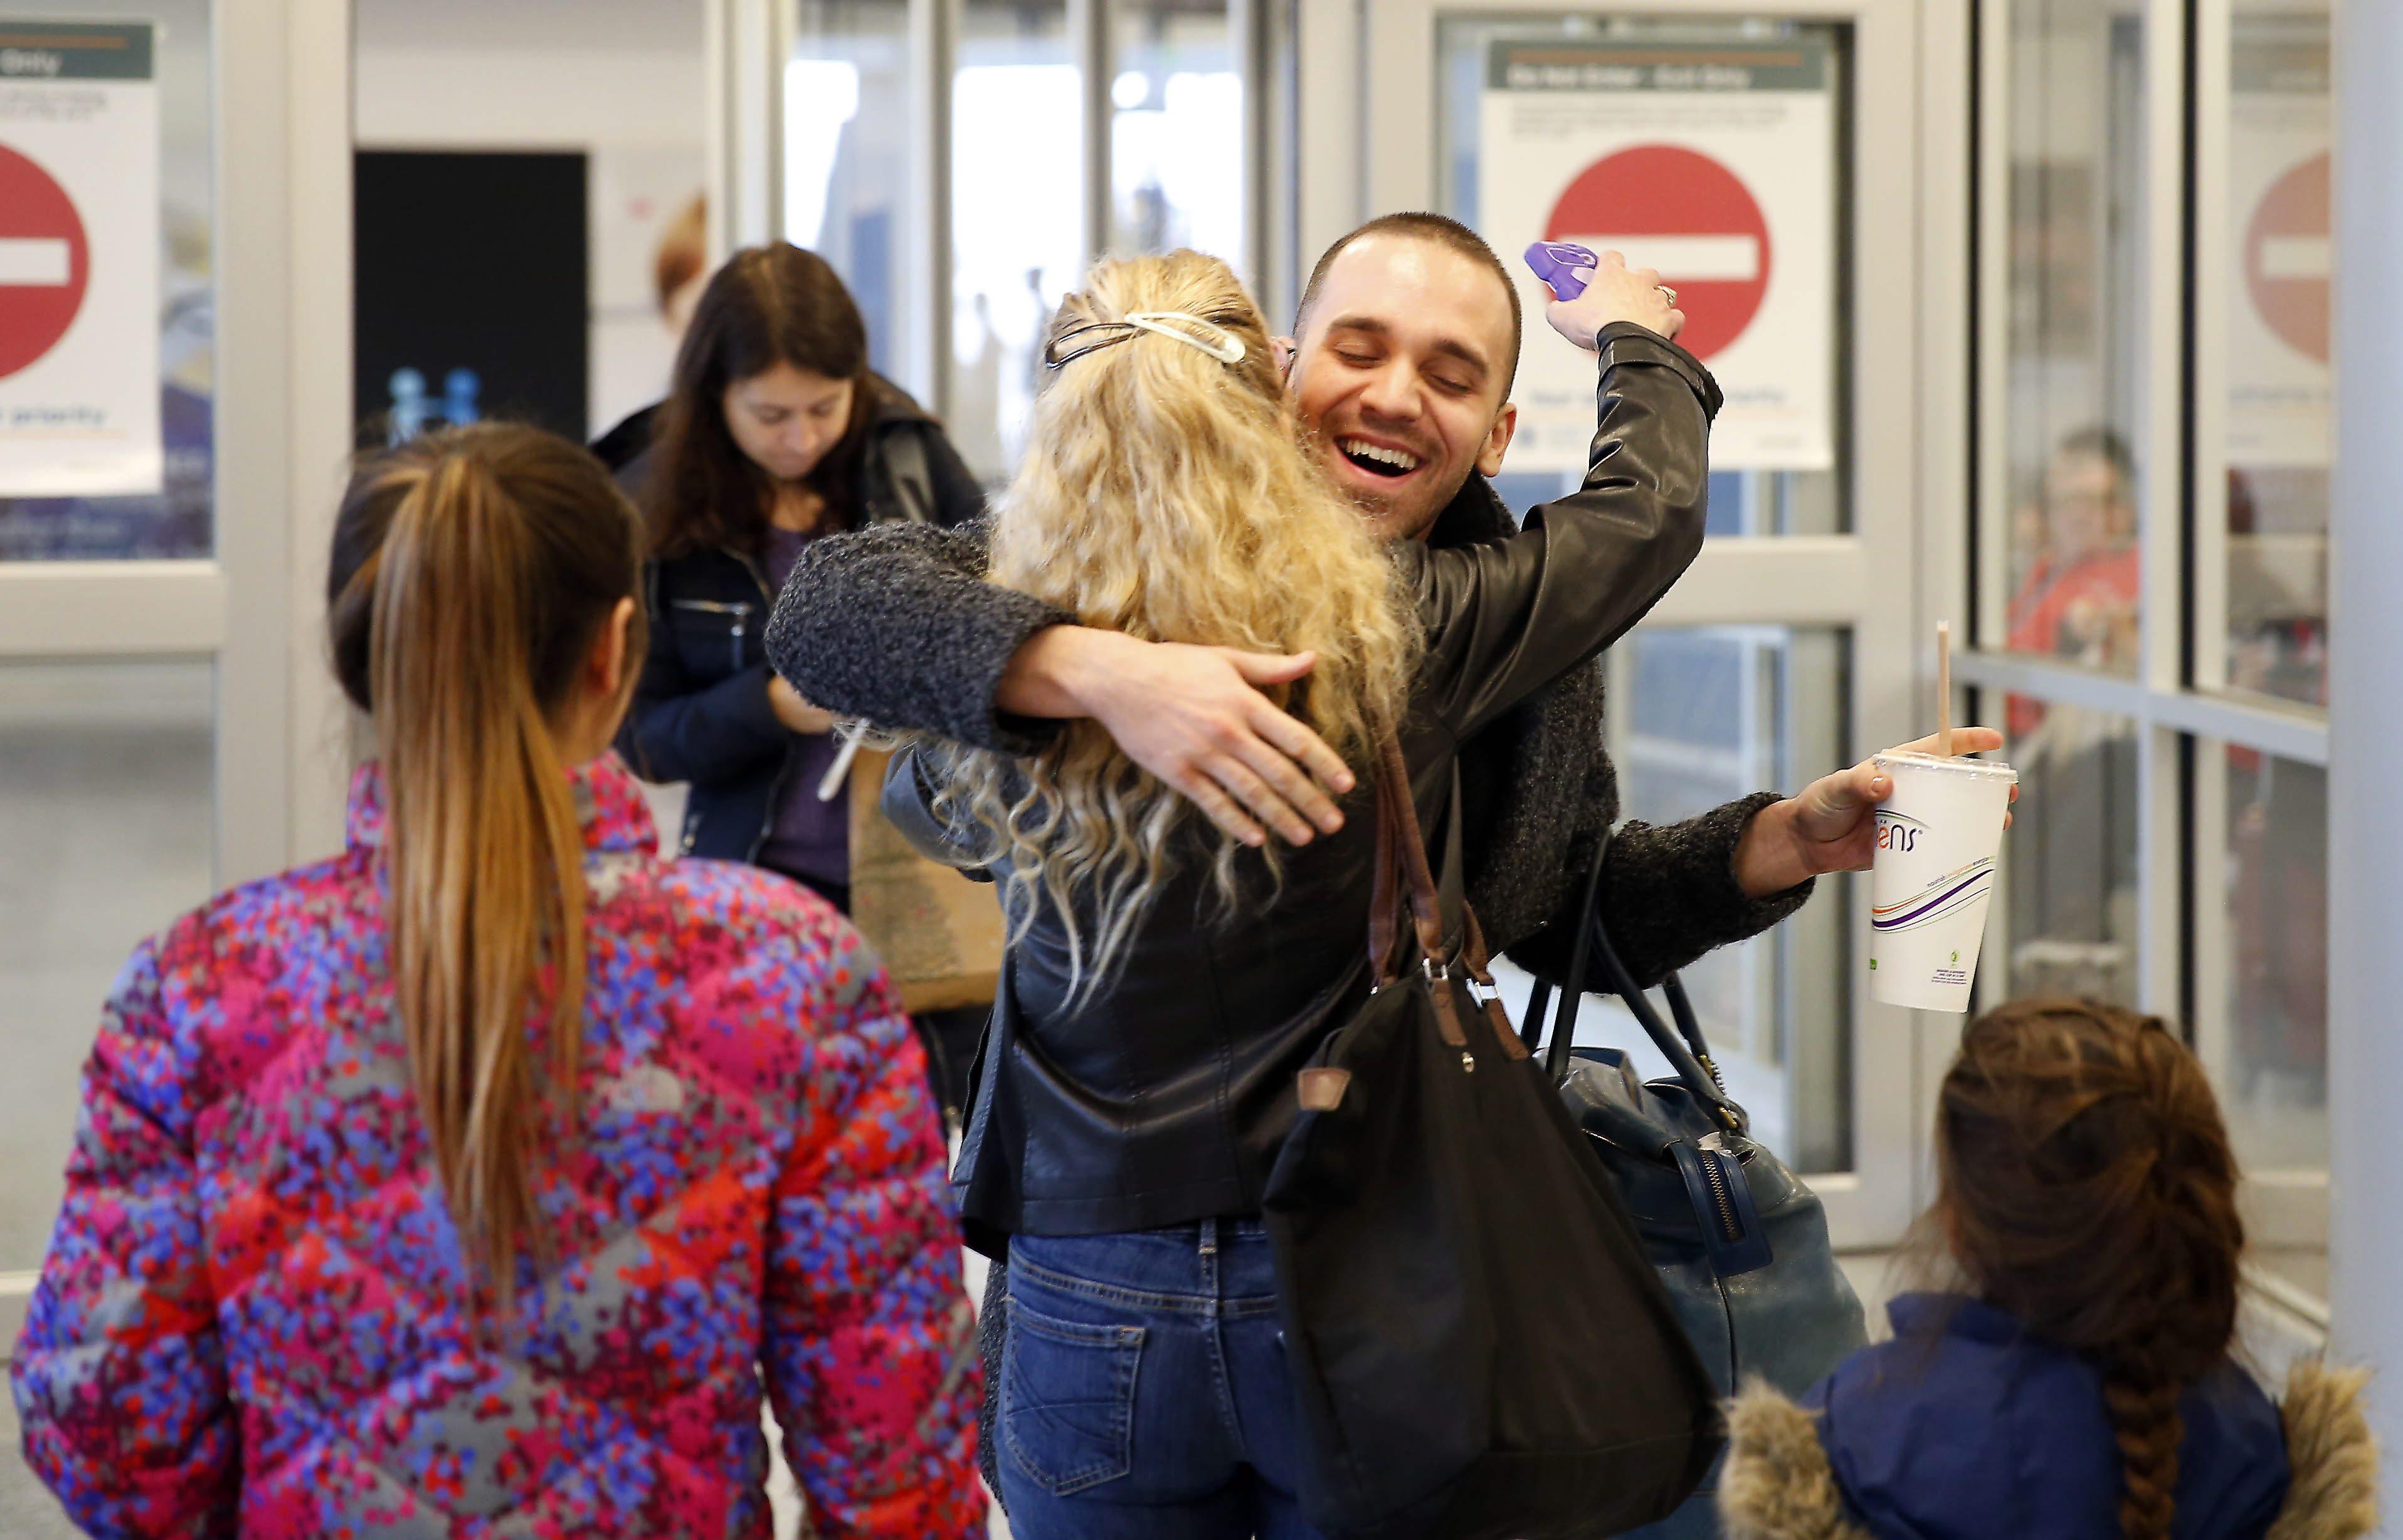 Deon Oliverio gets a hug from his mother, Lauretta Hersch, as he arrives at the Buffalo Niagara International Airport on Dec. 23.  (Mark Mulville/Buffalo News)